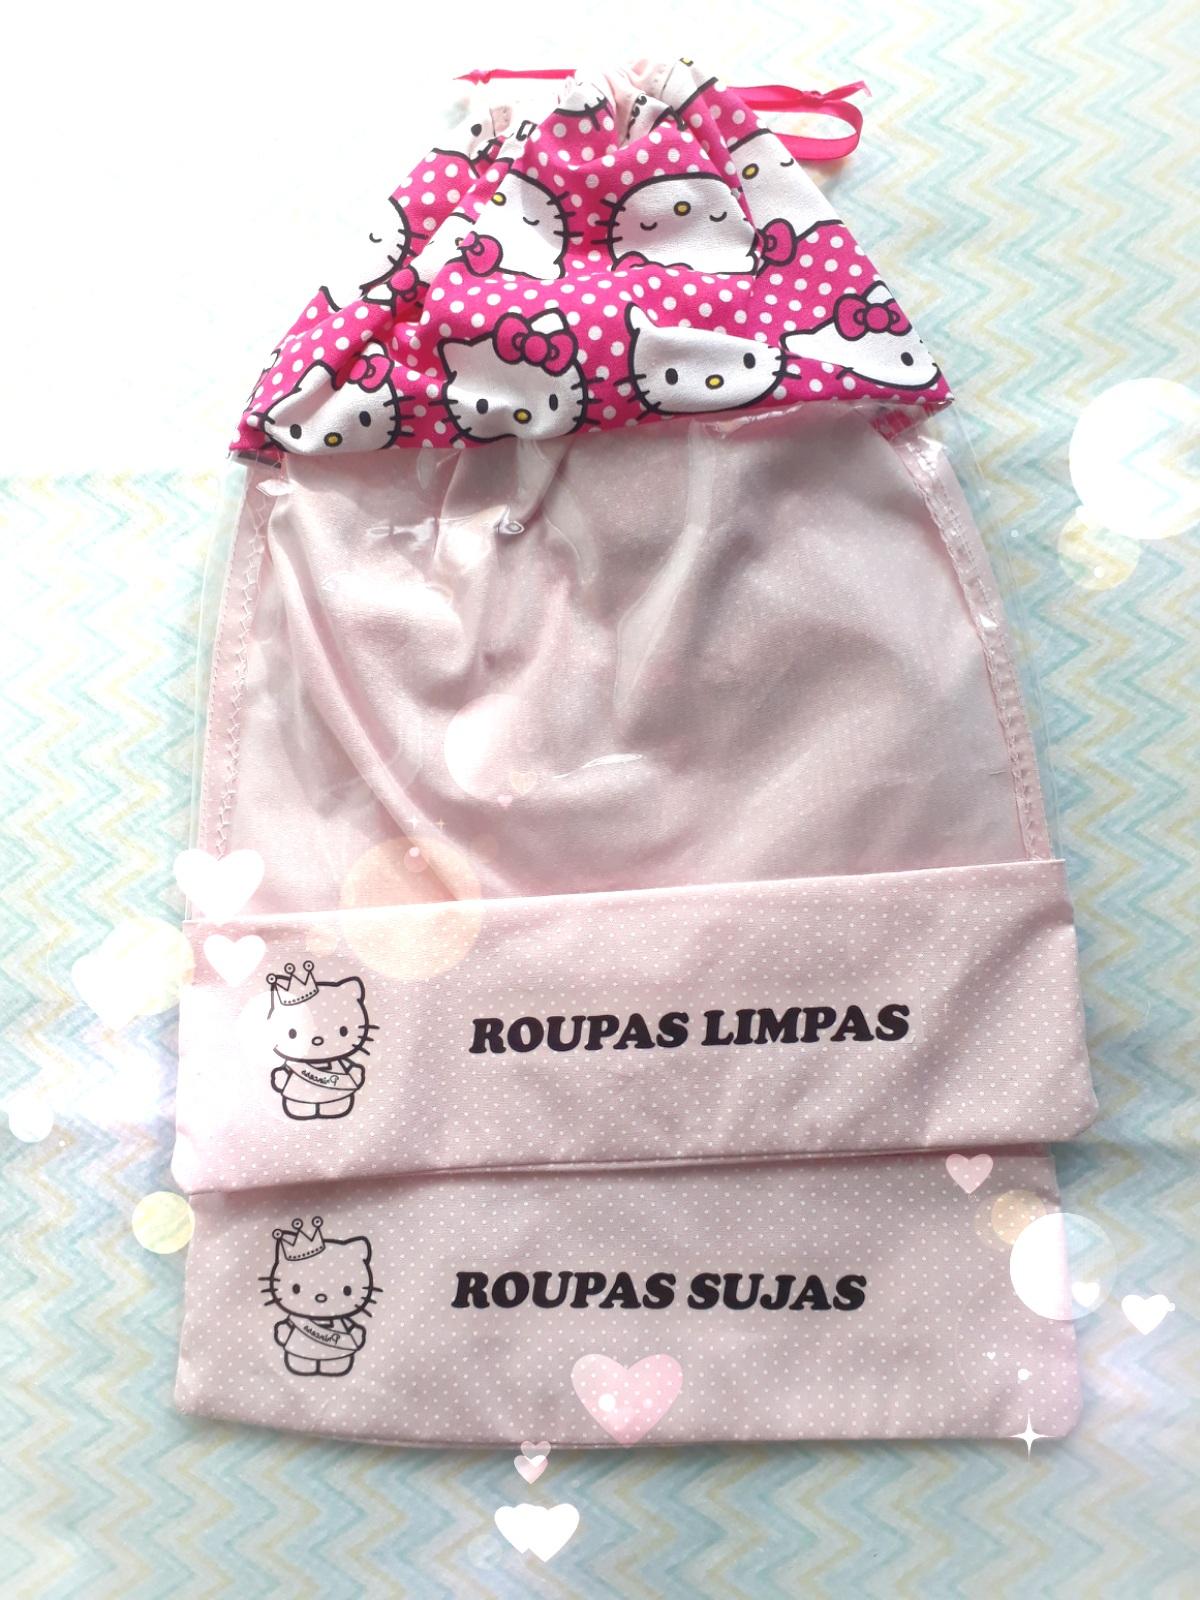 e26e2ddbb1 Kit Sacola Organizadora Roupa Limpa   Roupa suja Hello Kitty no Elo7 ...